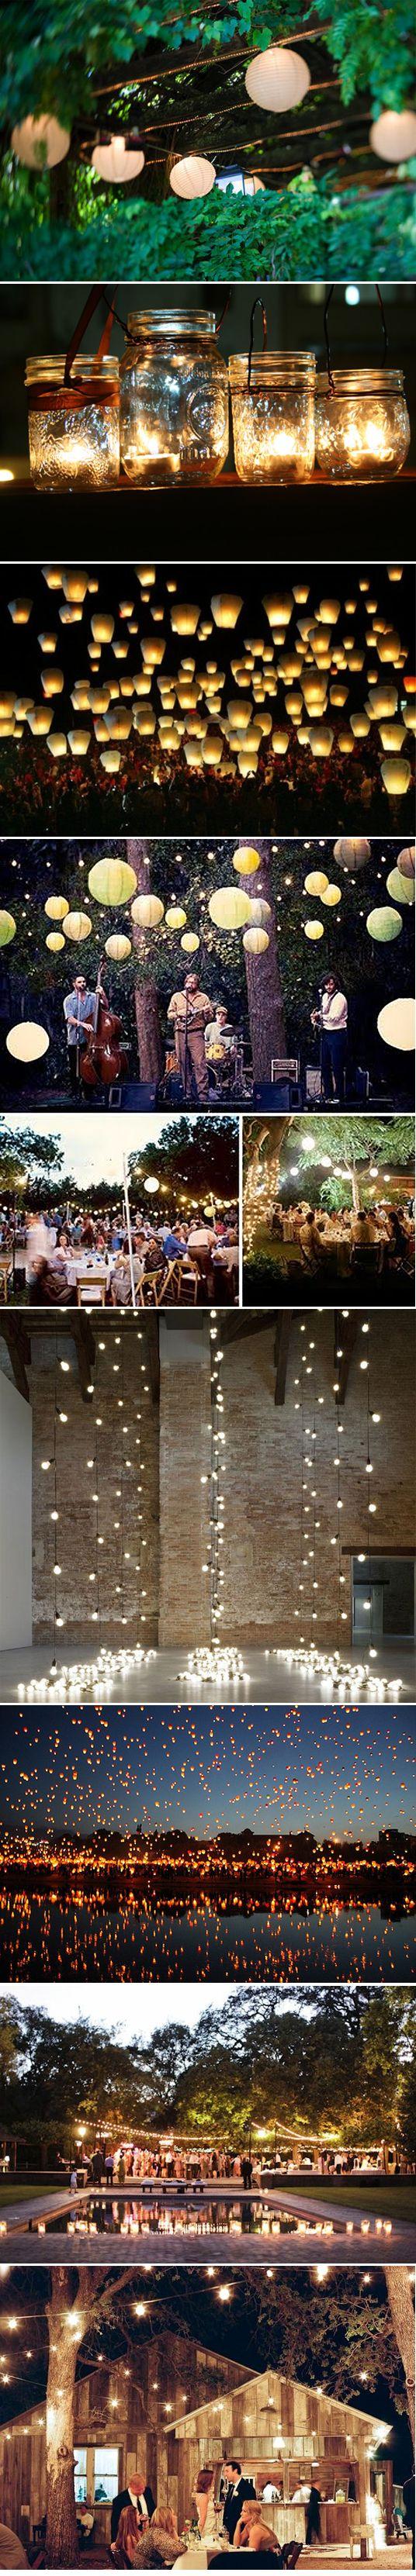 Light ideas for our backyard